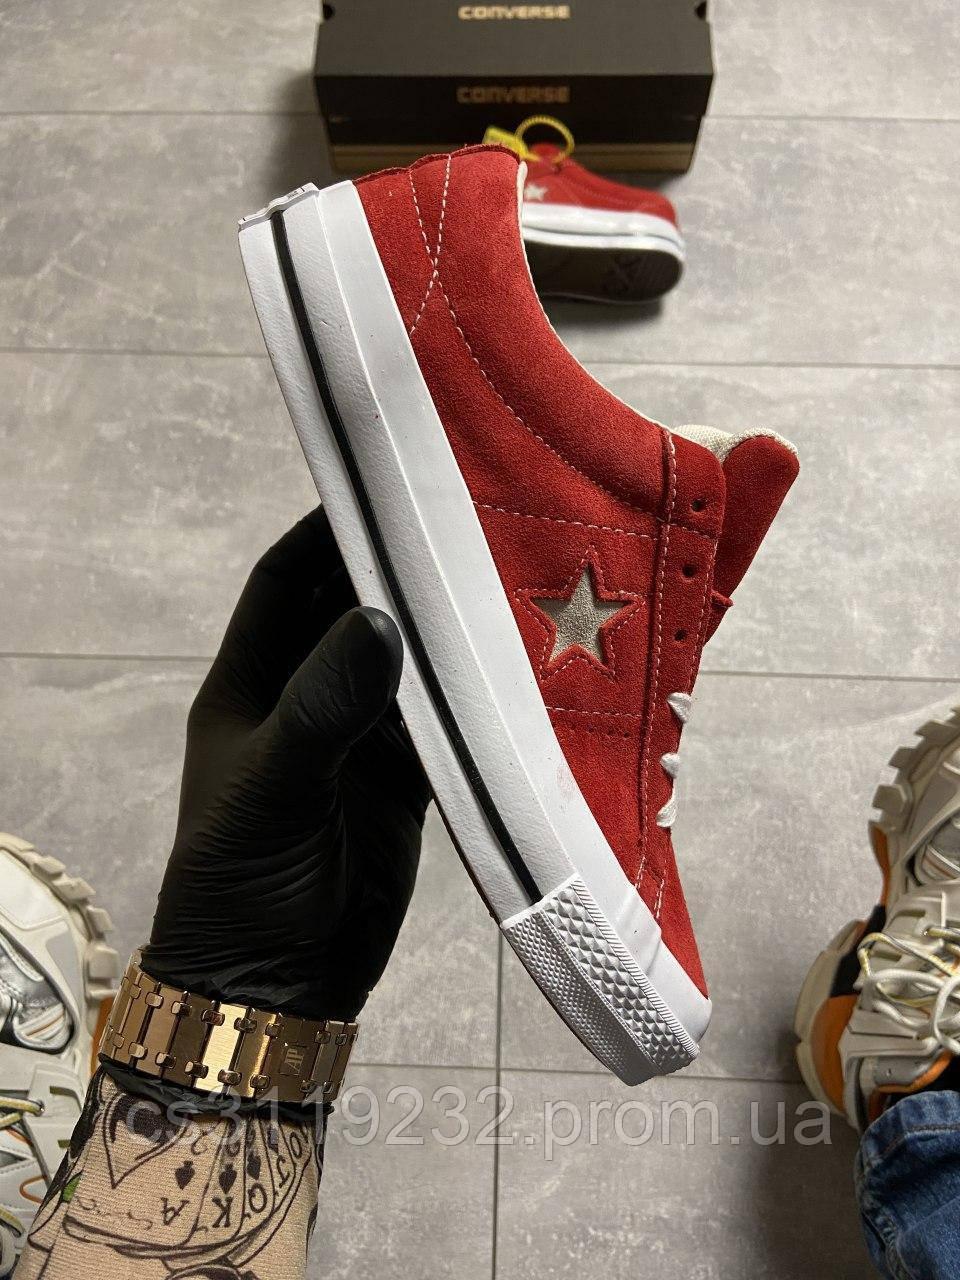 Женские кеды Converse One Star Premium Suede Red (красные)